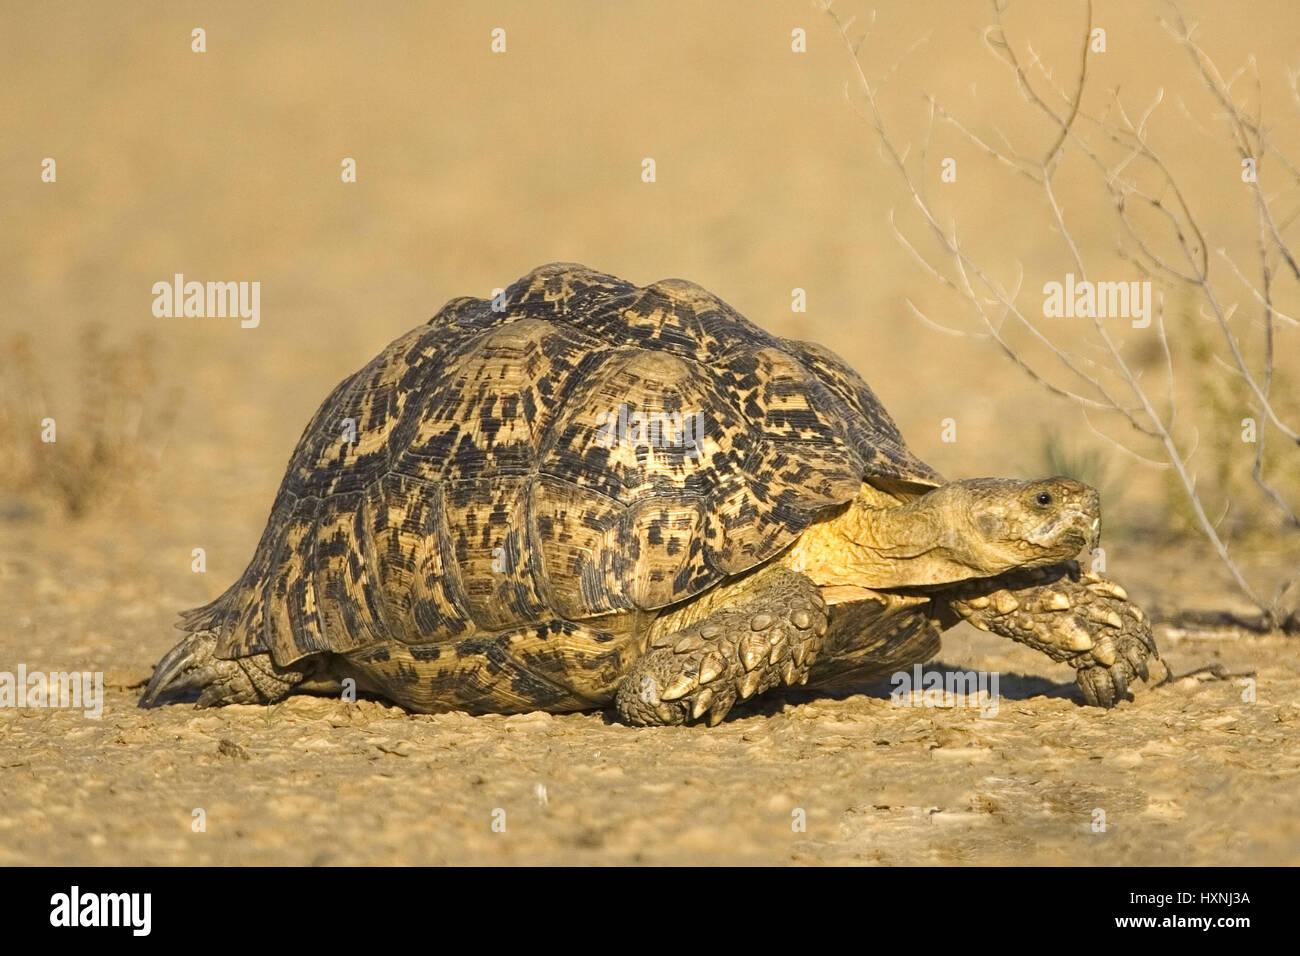 Panther's tortoise, leopard Tortoise - Geochelone pardalis, Pantherschildkroete | Leopard Tortoise - Geochelone - Stock Image